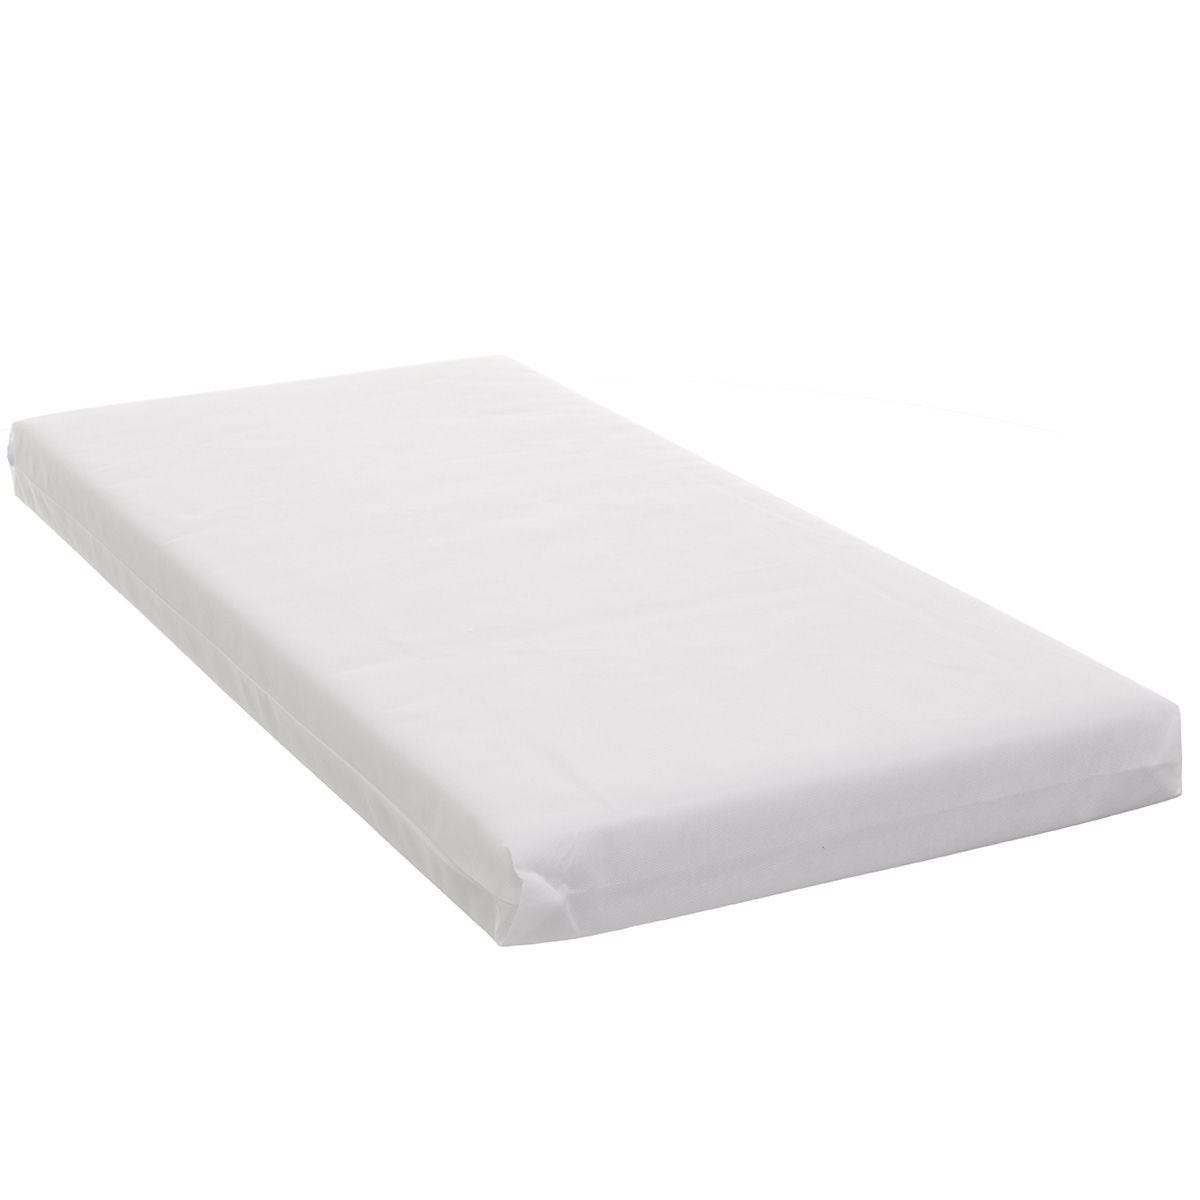 Obaby Eco Foam 140 X 70 Cot Bed Mattress